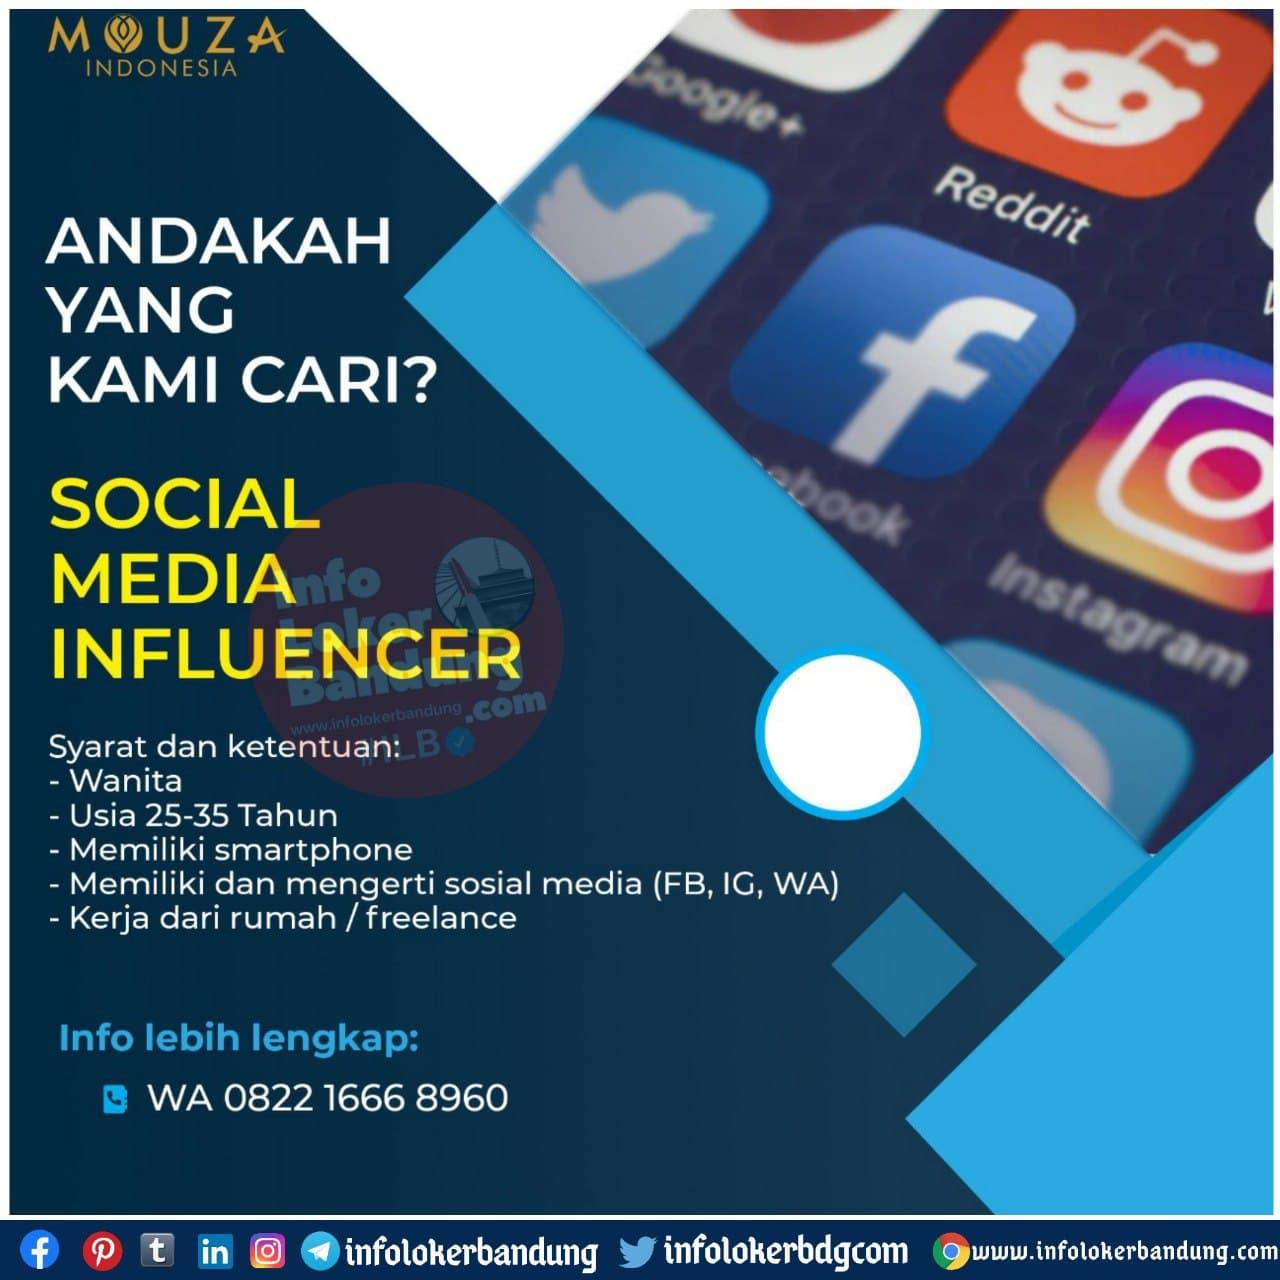 Lowongan Kerja Social Media Influencer Mouza Indonesia Bandung November 2020